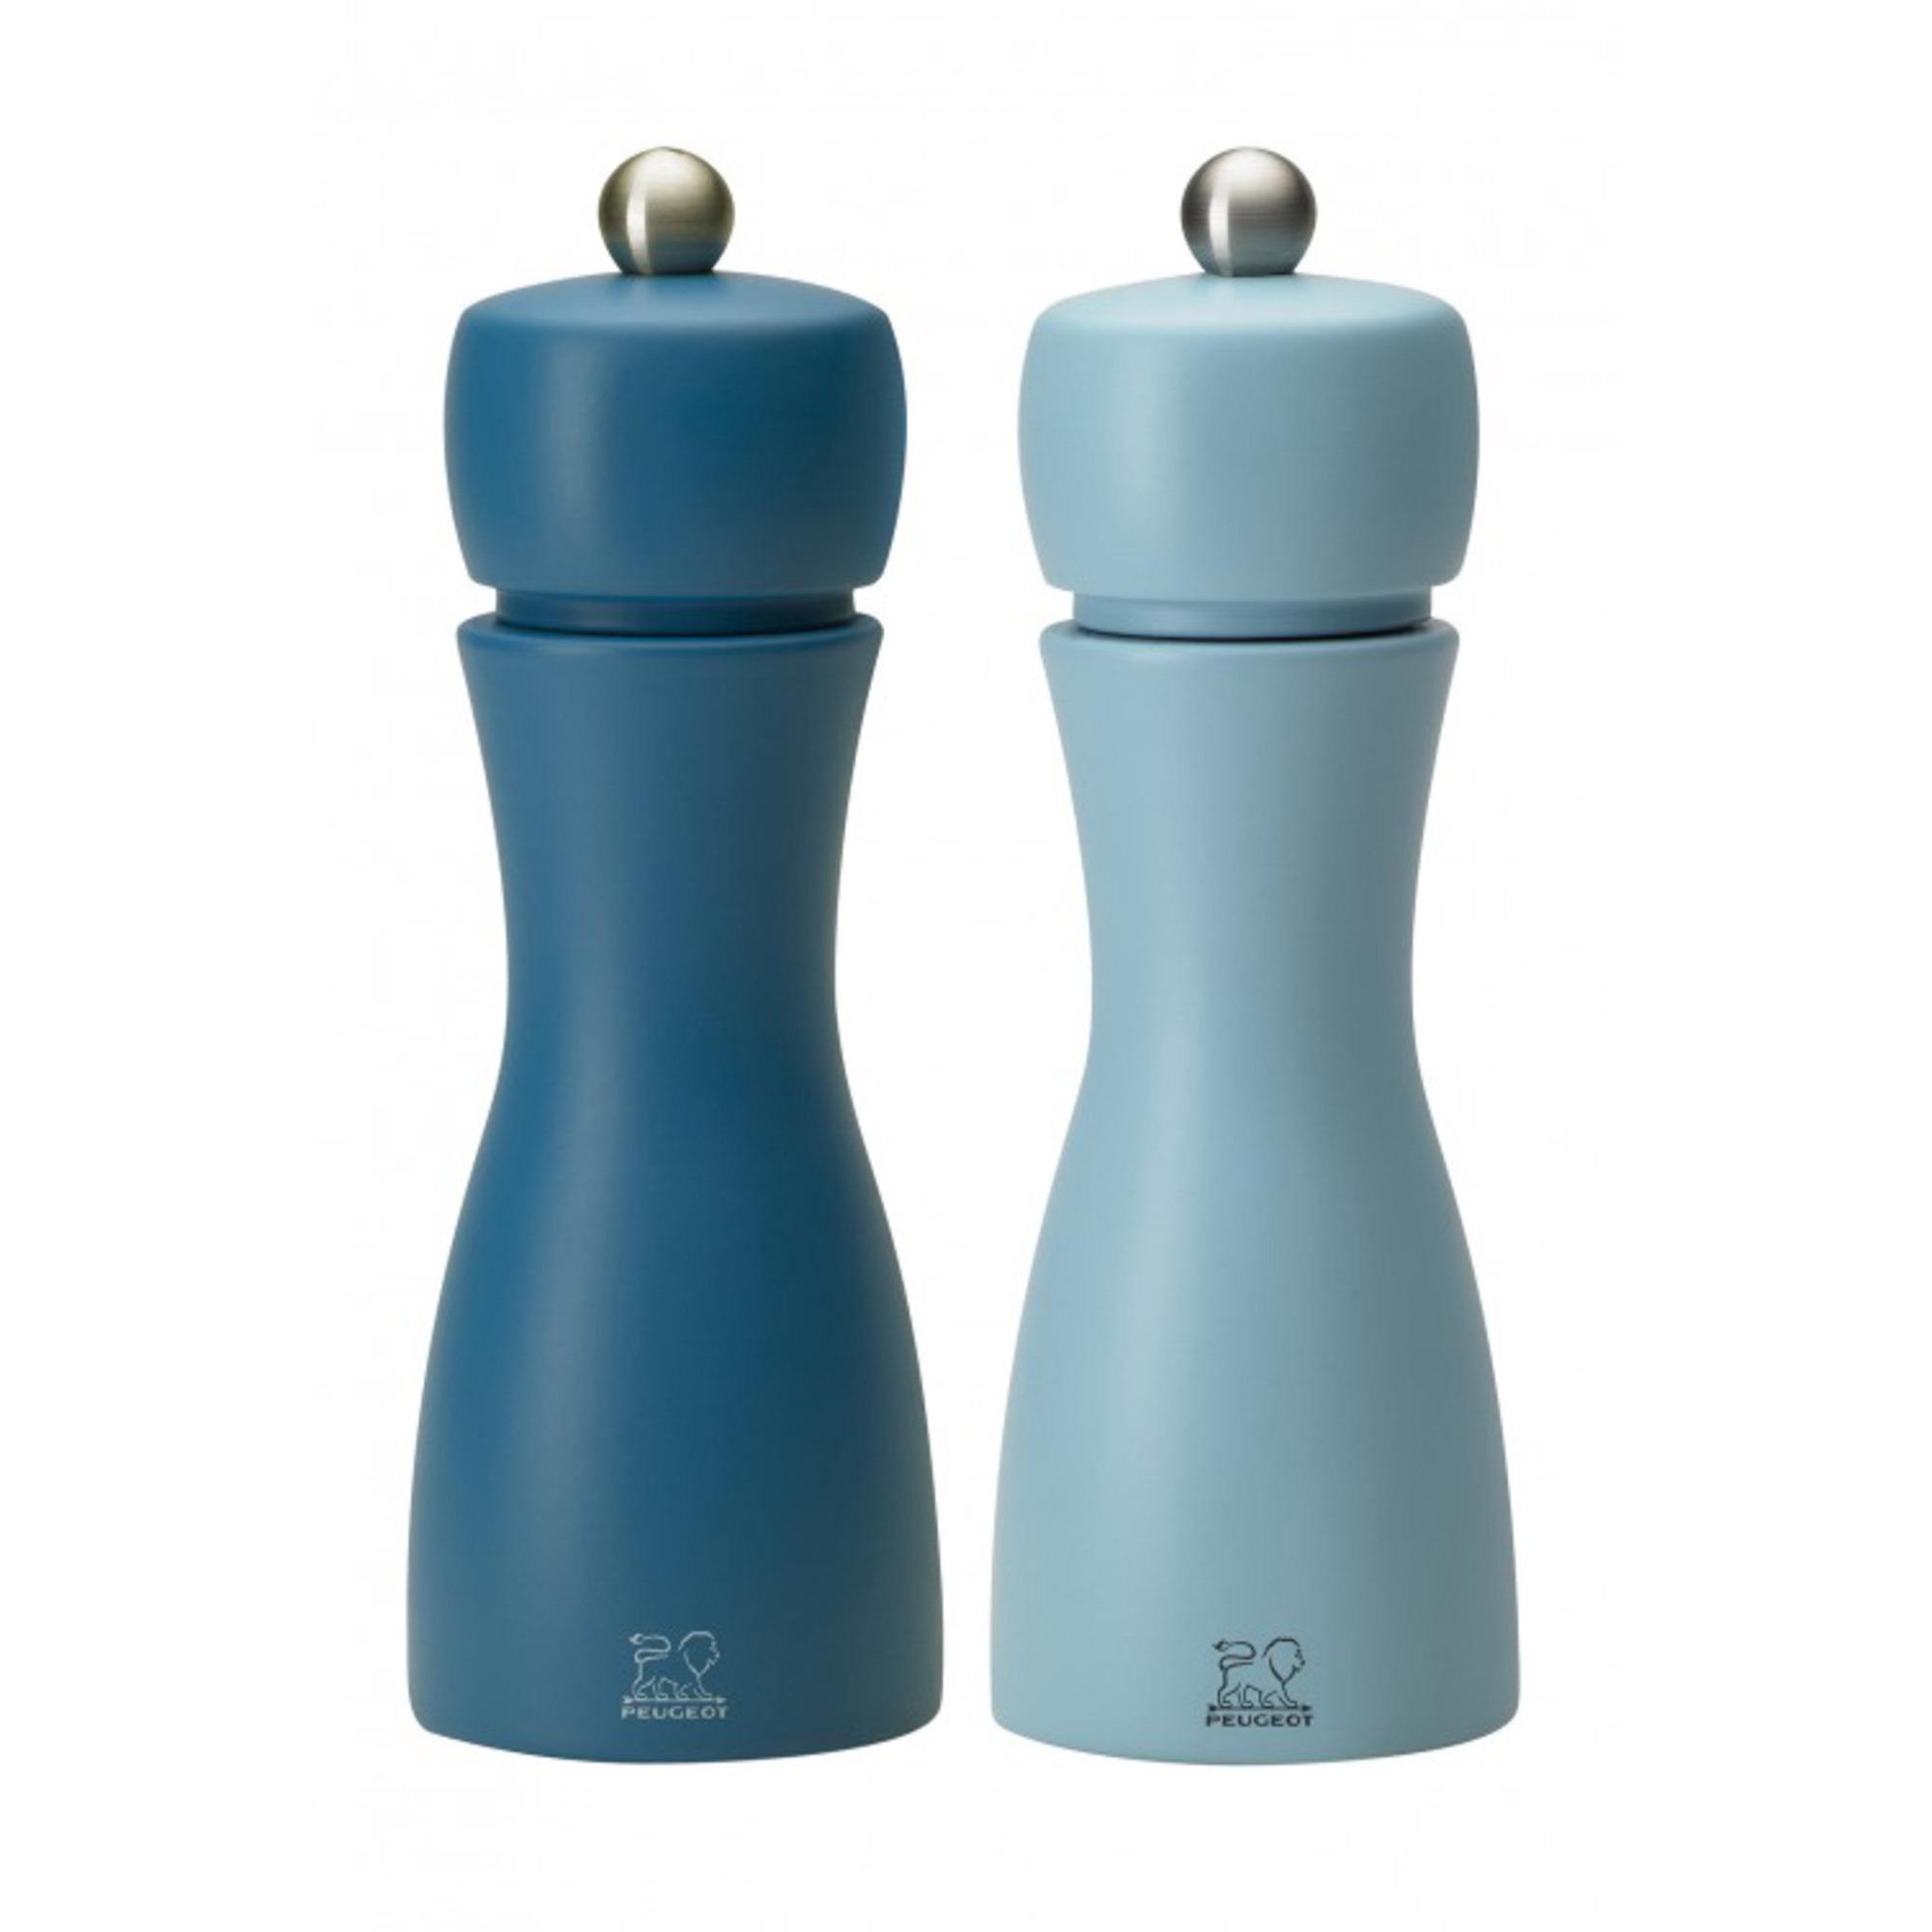 Peugeot Tahiti Duo Salt & Pepparkvarnar 15 cm Sommar